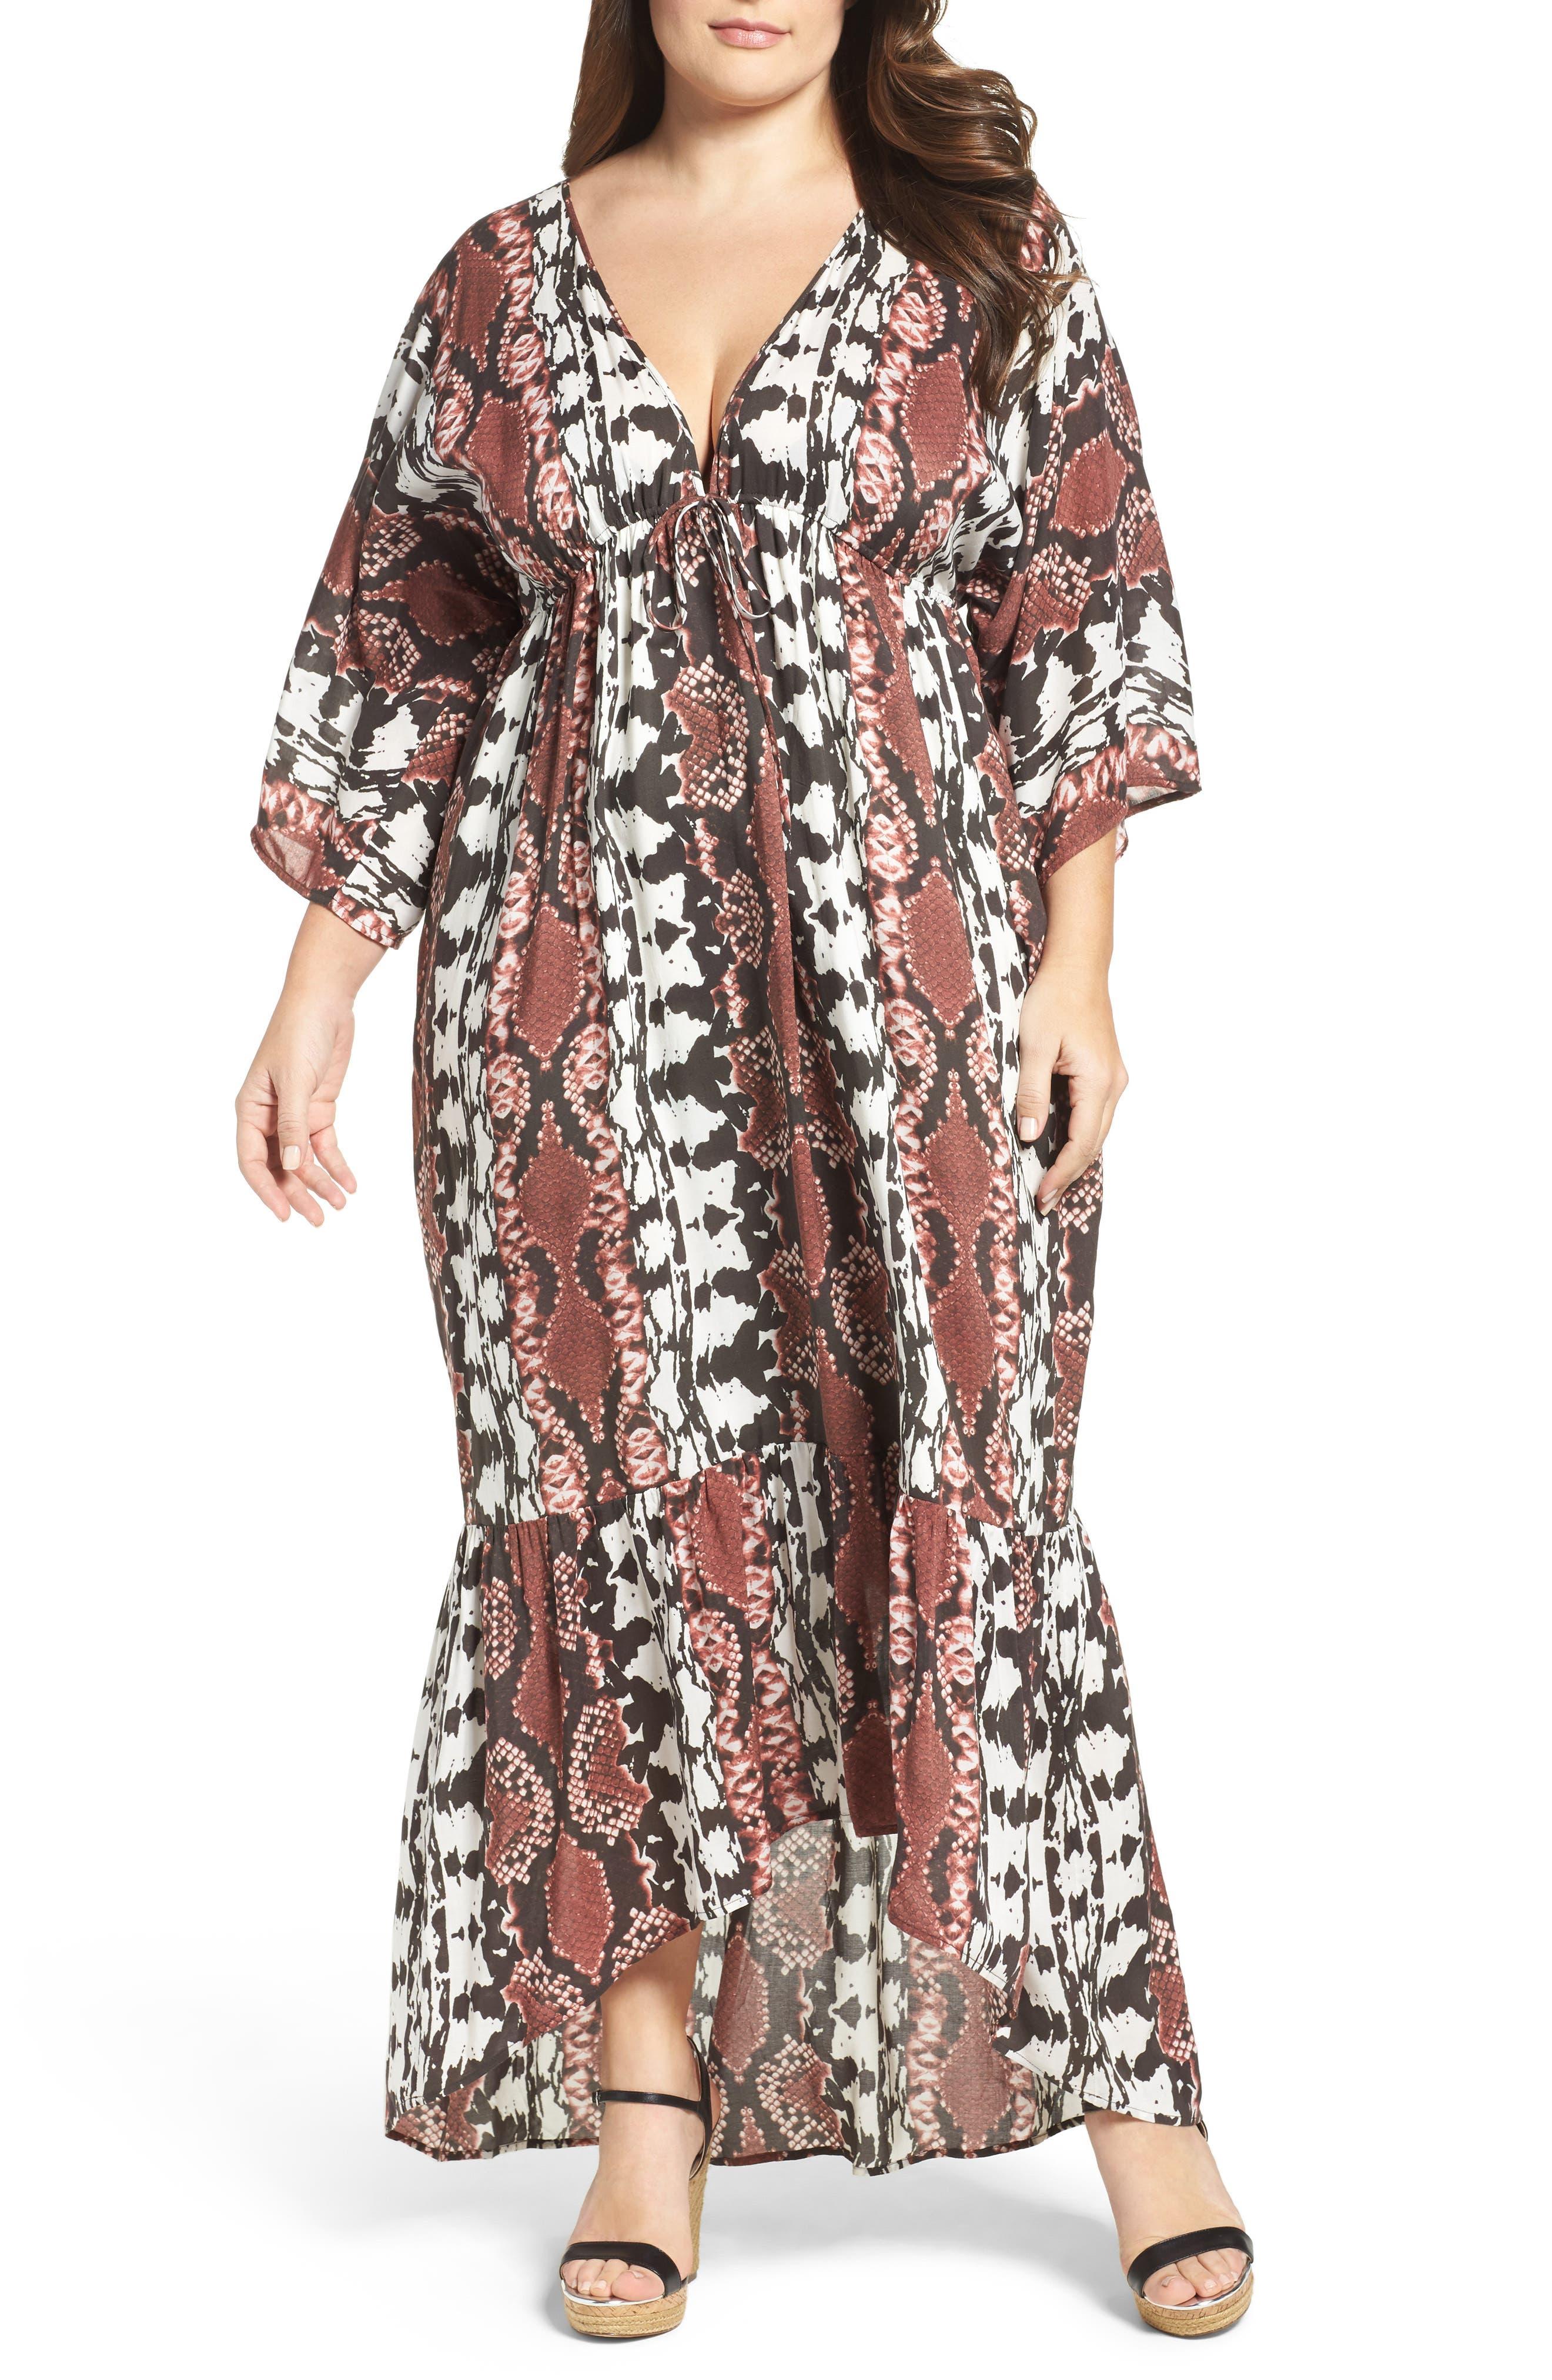 Alternate Image 1 Selected - Tart Camellia Maxi Dress (Plus Size)